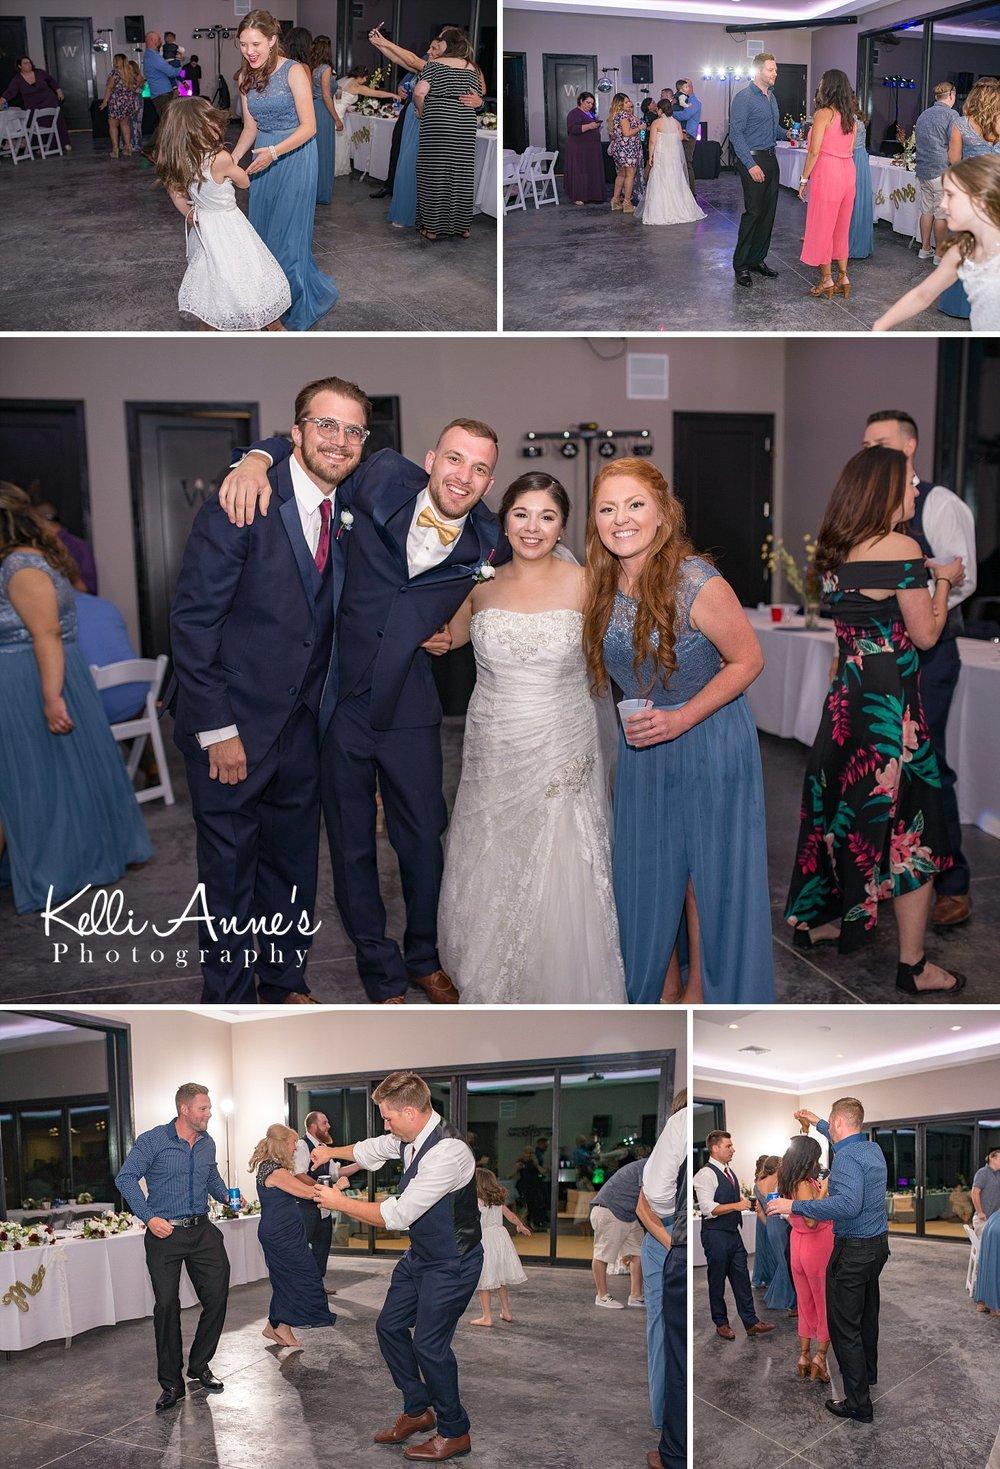 Dancing, Break Dacing, Spinning, Bride, Groom, Bridal Party, kids, Children